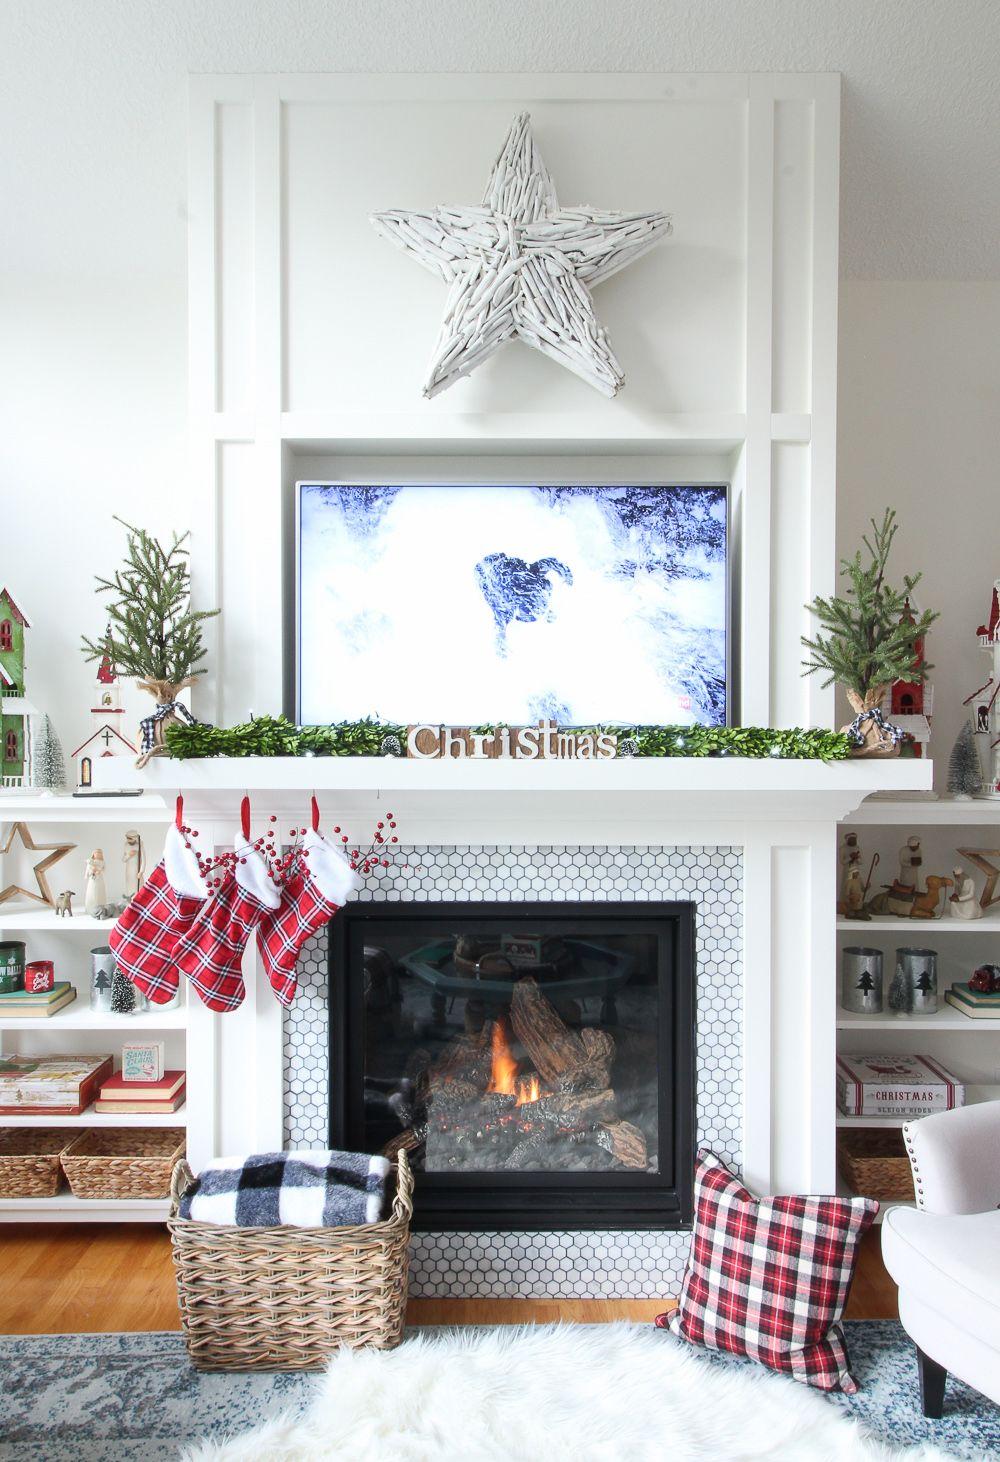 10 Festive Christmas Mantel Ideas   How to Style a Holiday Mantel